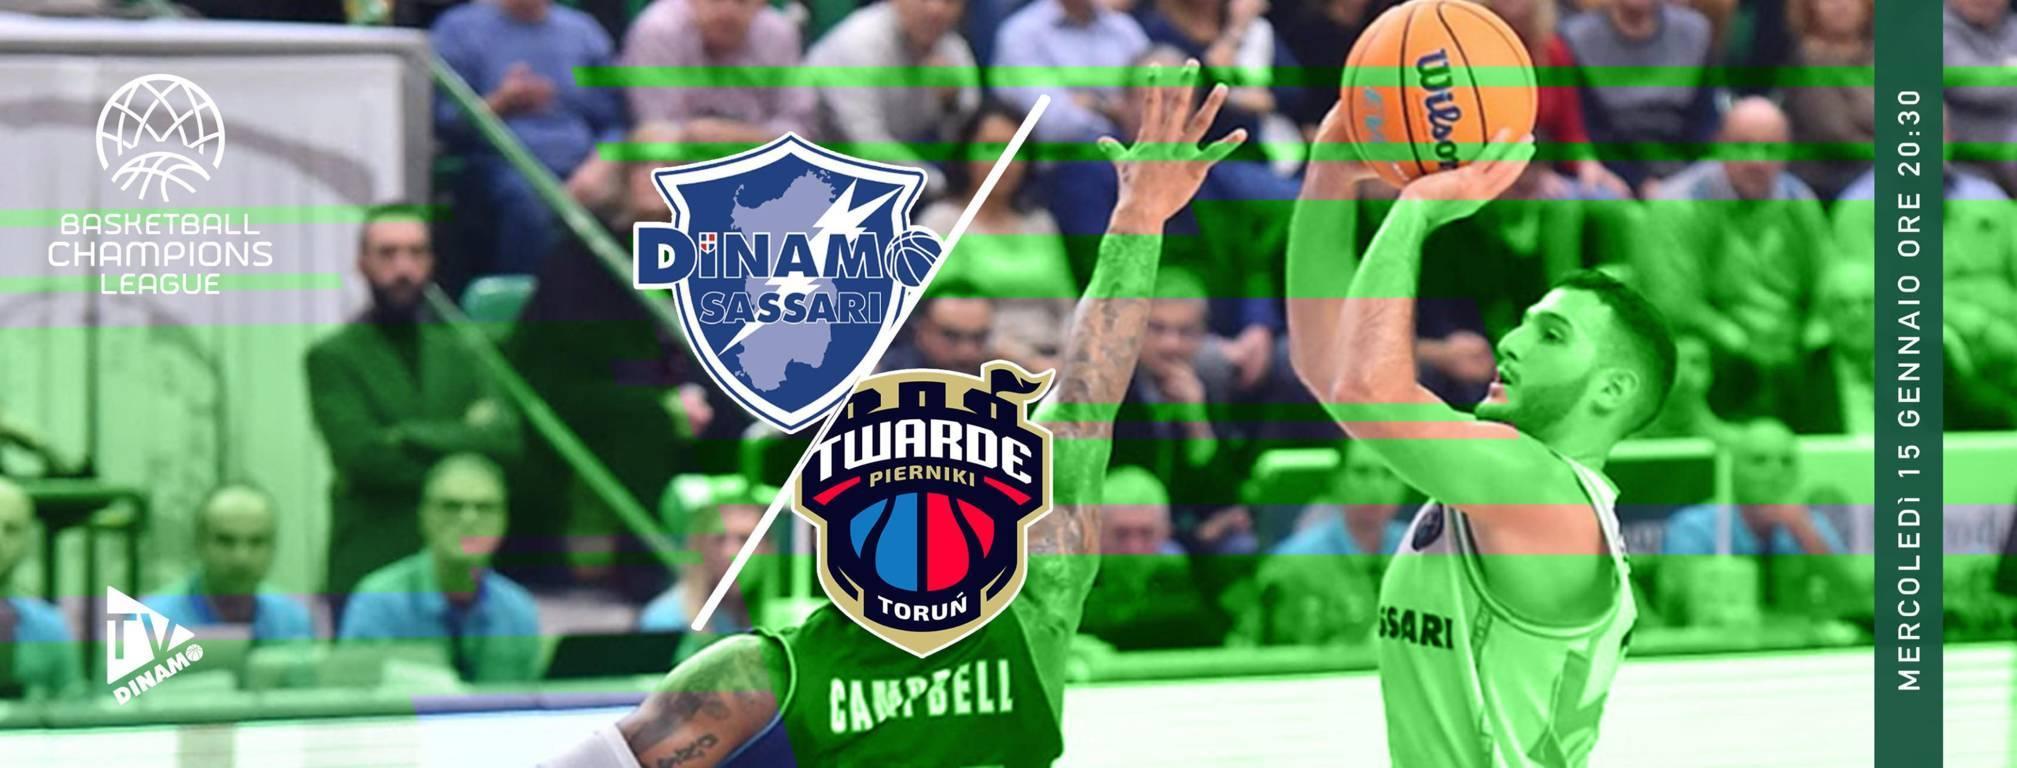 Basketball Champions League #Round11 2019-20: la Dinamo Sassari attend i polacchi del Polski Torun